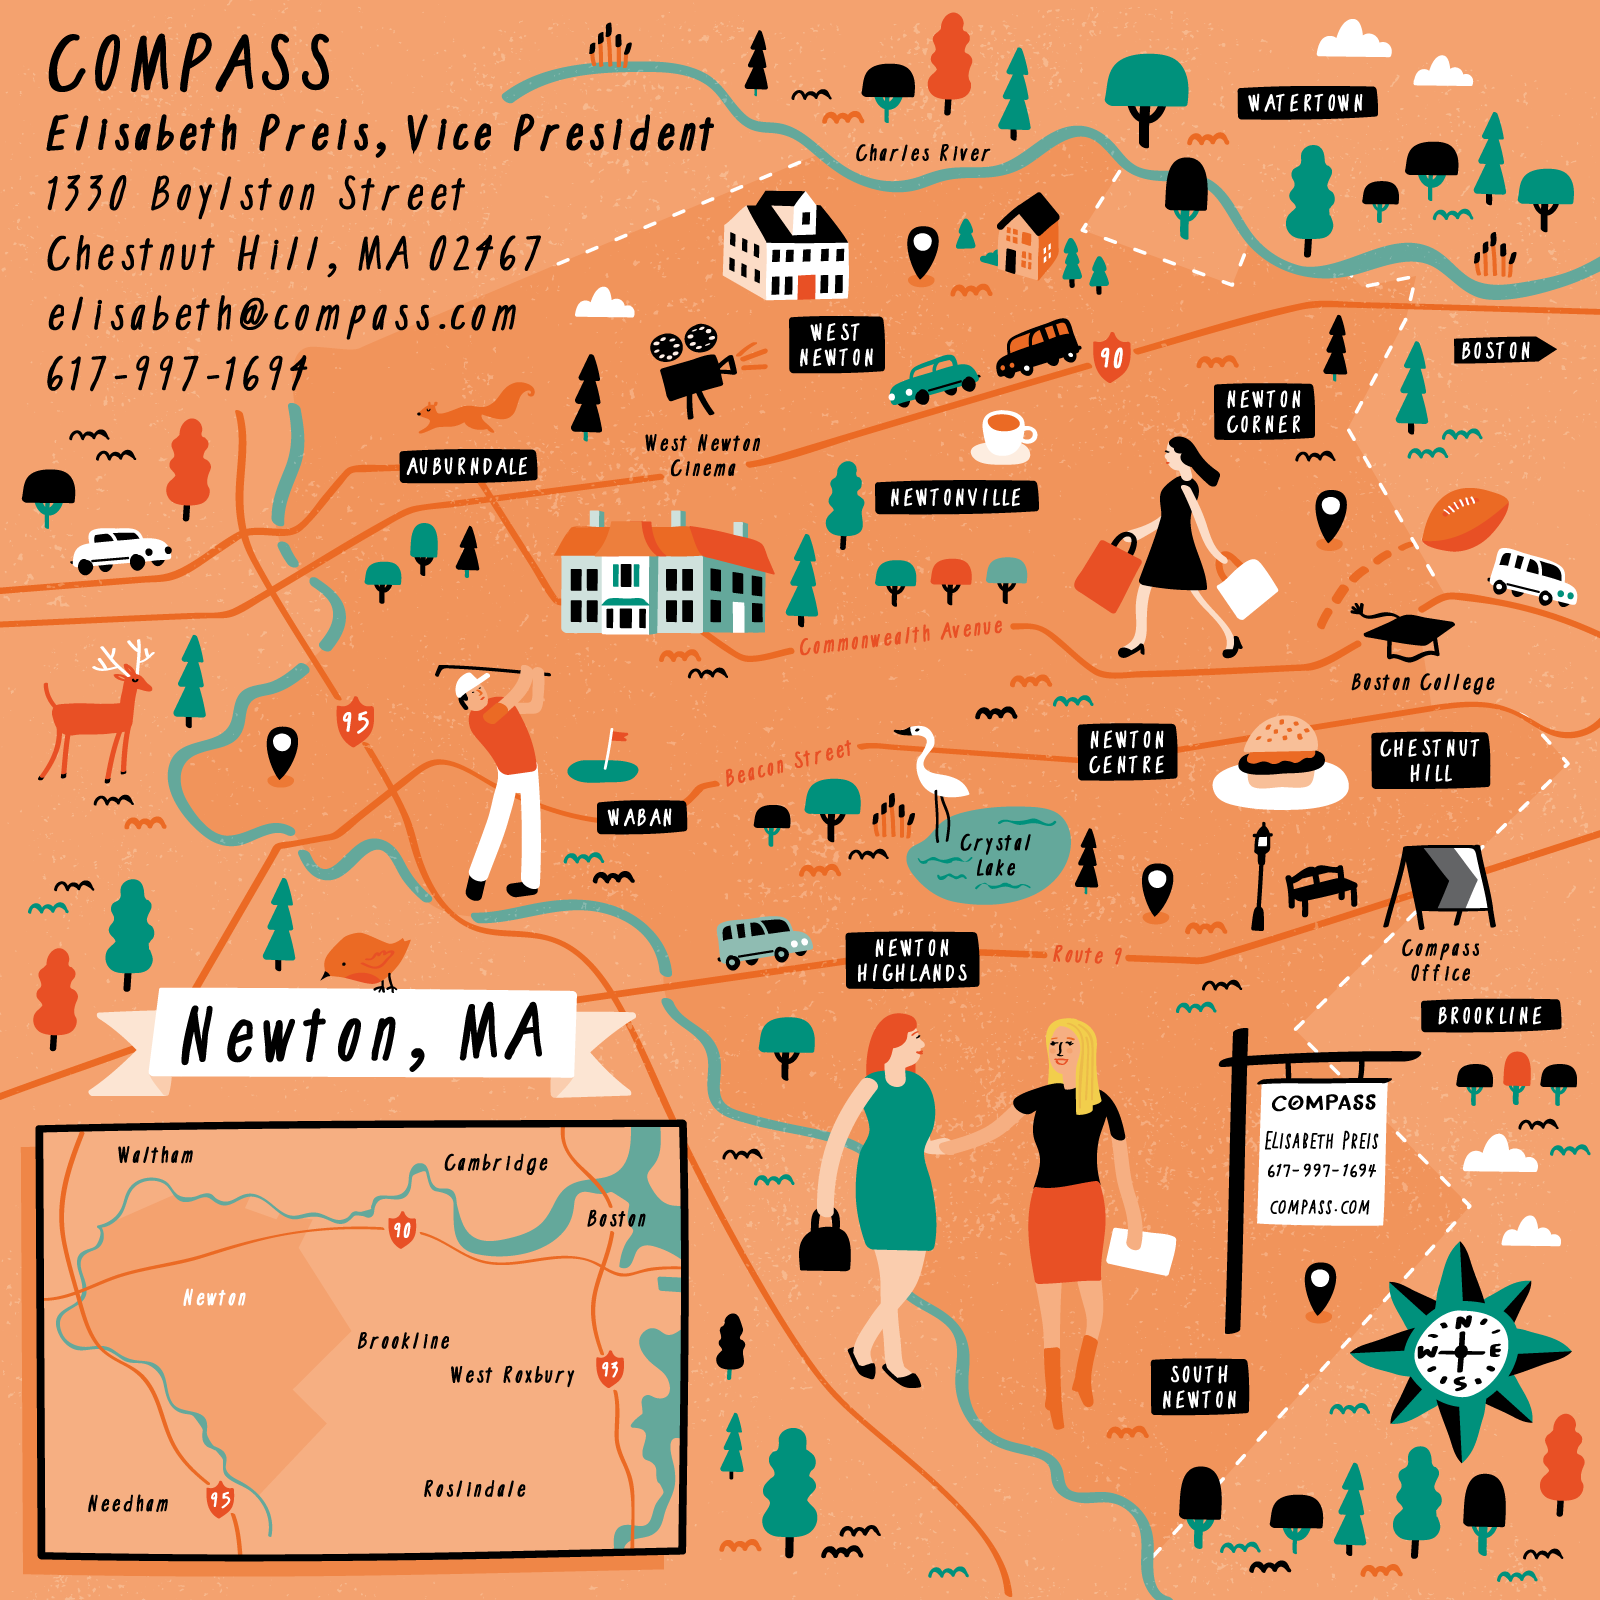 Illustrated-Map-of-Newton,-MA-by-Nate-Padavick-WEB.png